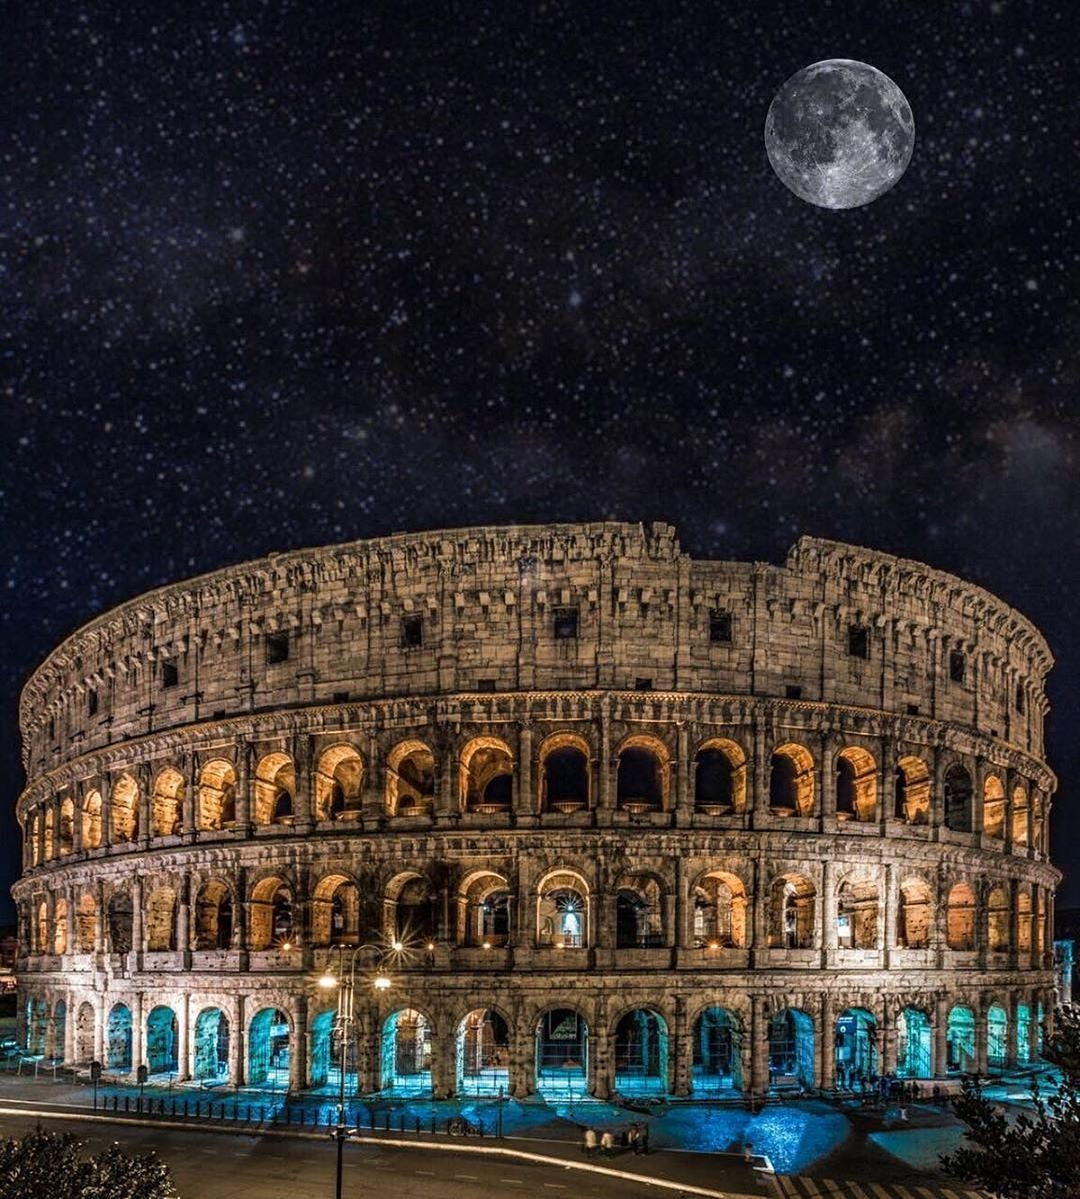 Romantic Rome in Moonlight 🌌❤  📍Rome, Italy   🌐Website-    #LPOholidays #Europe #Europeandelight #europeanelegance #europeanpackages #travellingthroughtheworld #tourism #rome #colosseum #colosseumrome